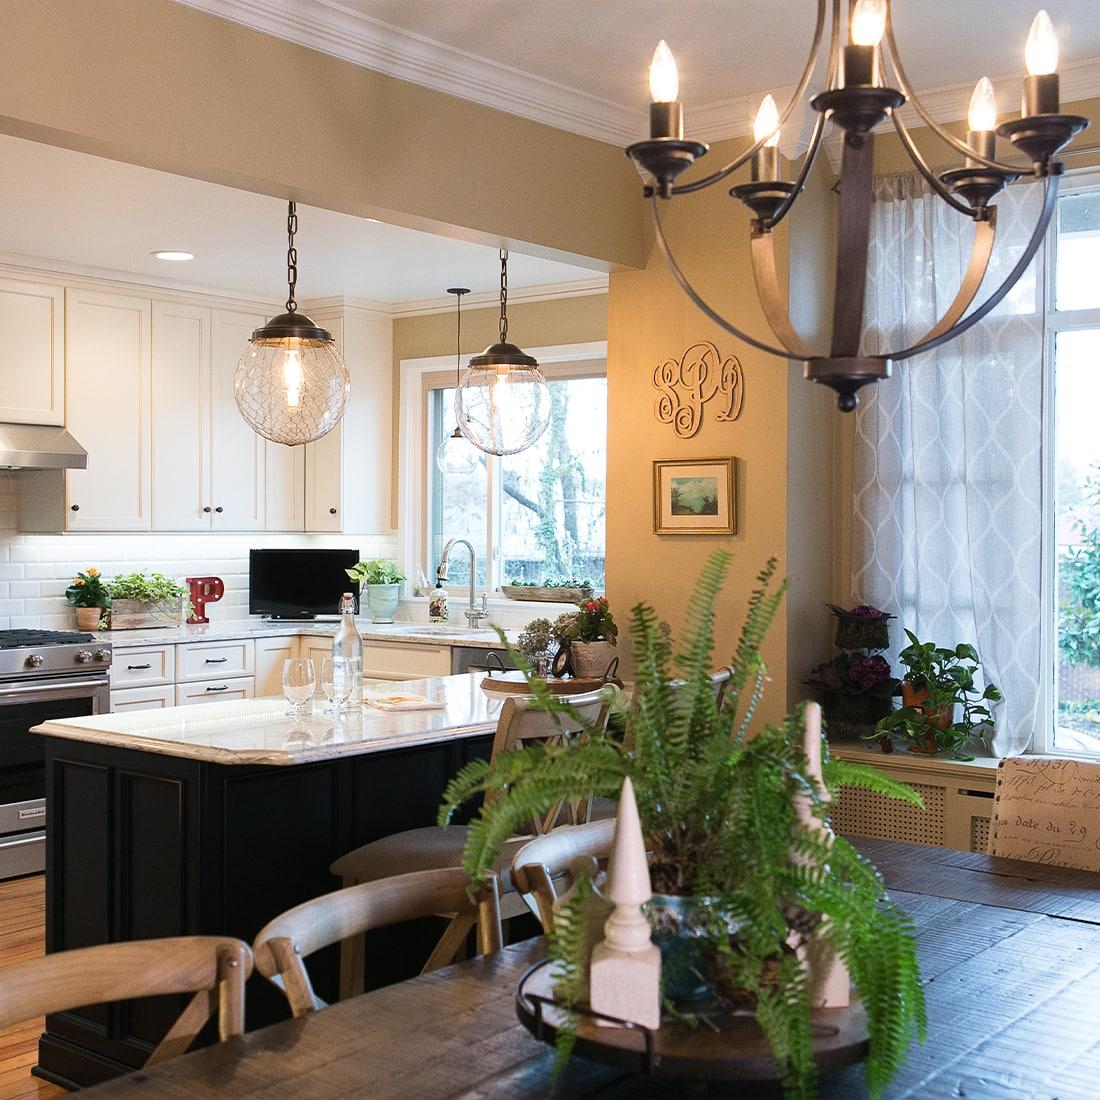 Dark hardware contrast white cabinets in renovated kitchen